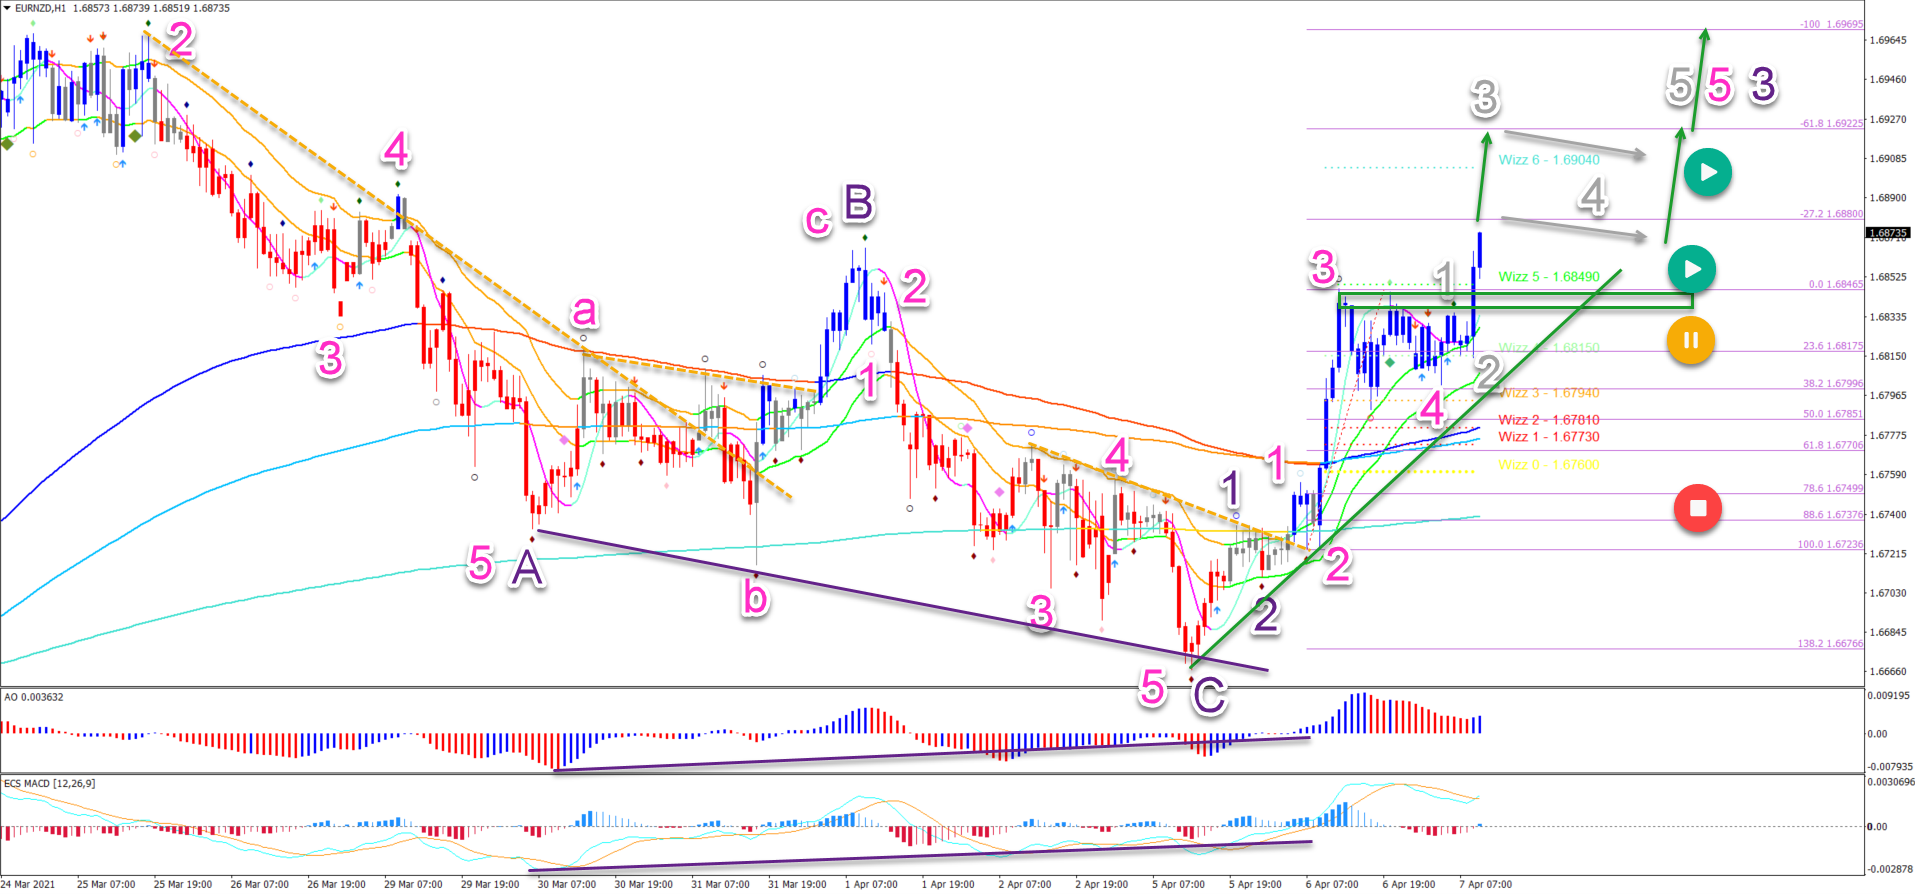 7.4.2021 EUR/NZD 1 hour chart